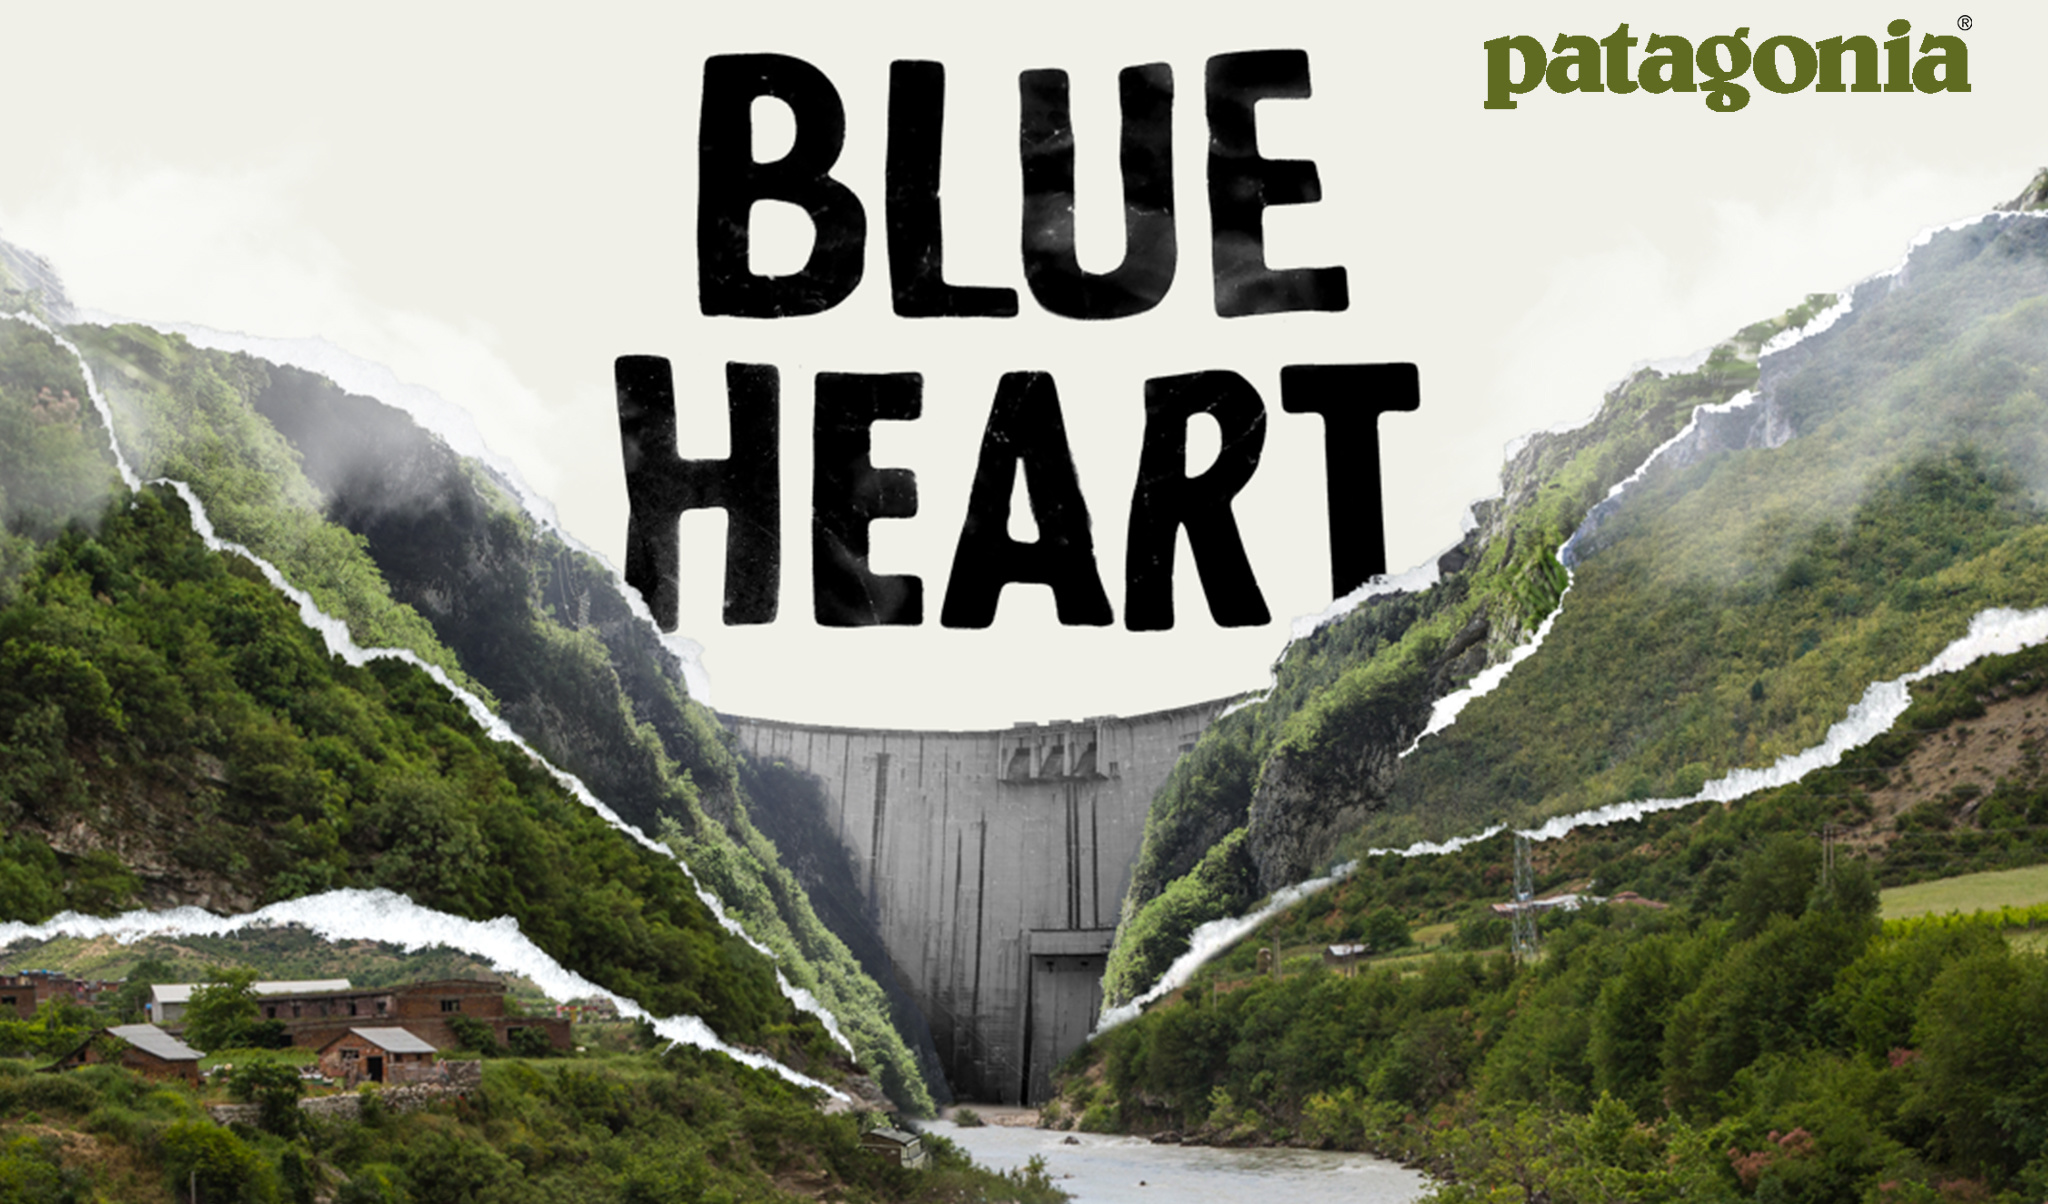 Patagonia - Blue Heart